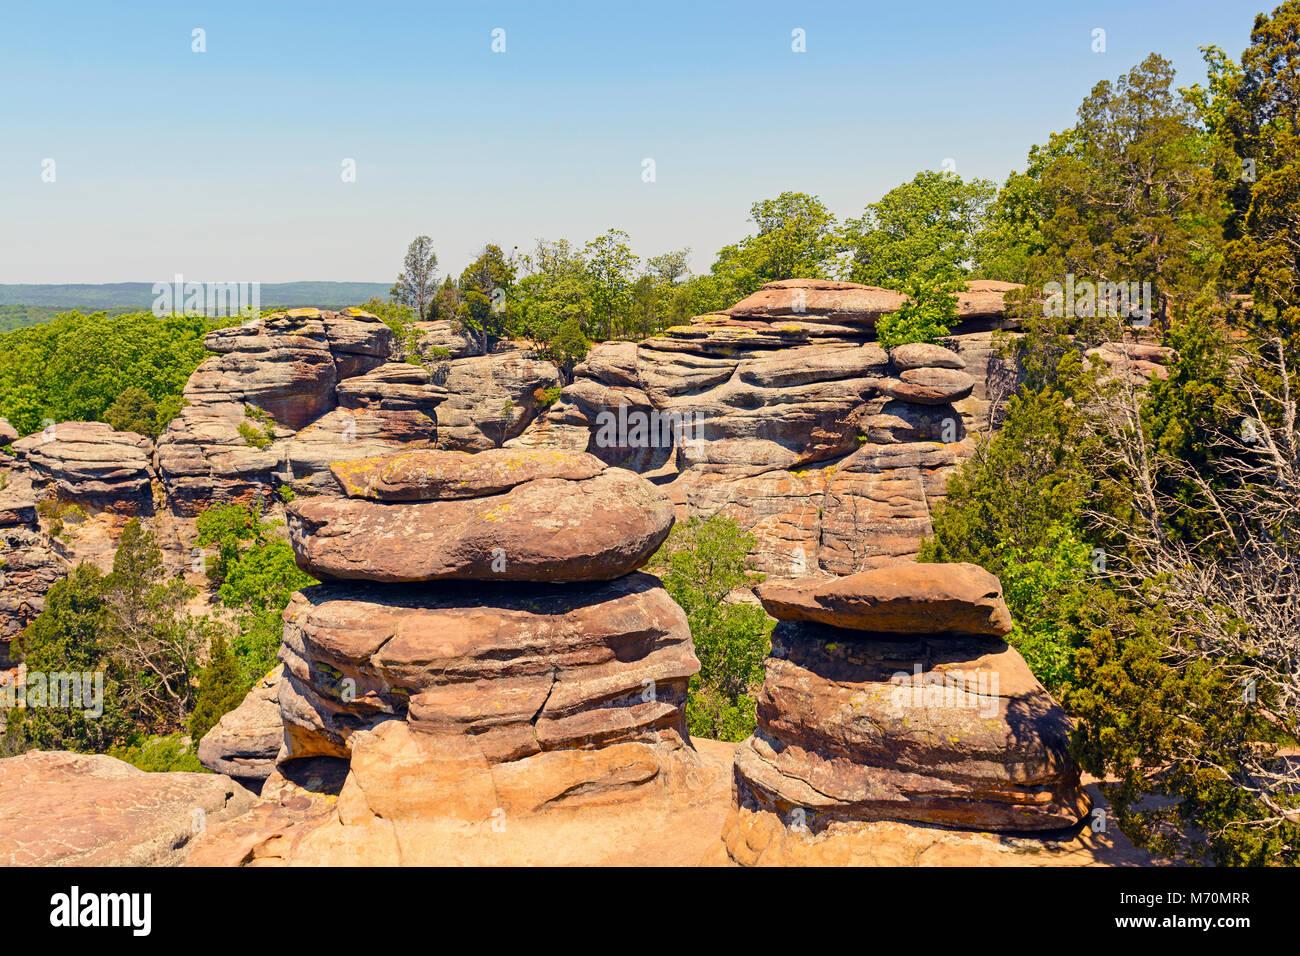 sandstone bluffs of the garden of the gods in shawnee national forest in illinois - Shawnee National Forest Garden Of The Gods